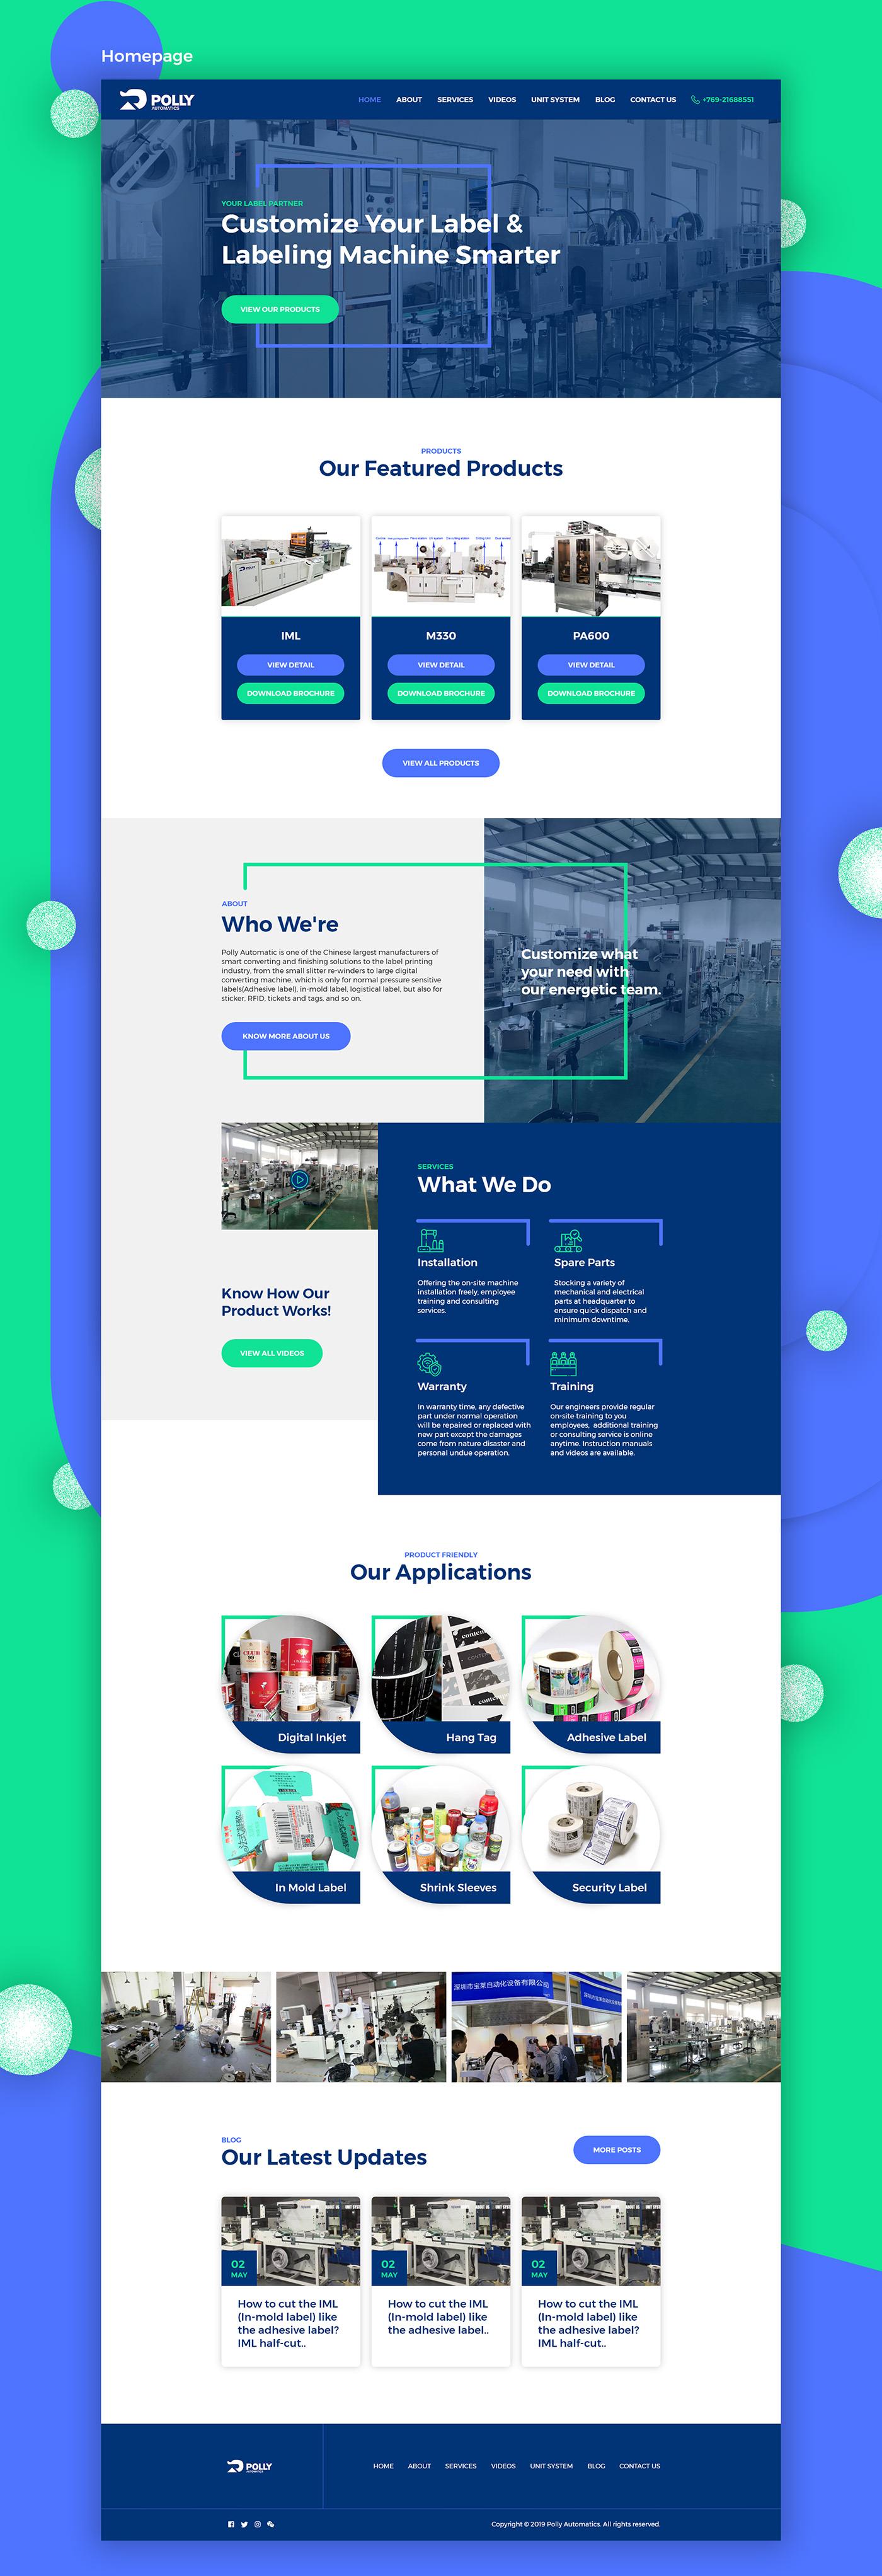 Web Webdesign Website uiux UserInterface UserExperience interaction websitedevelopment